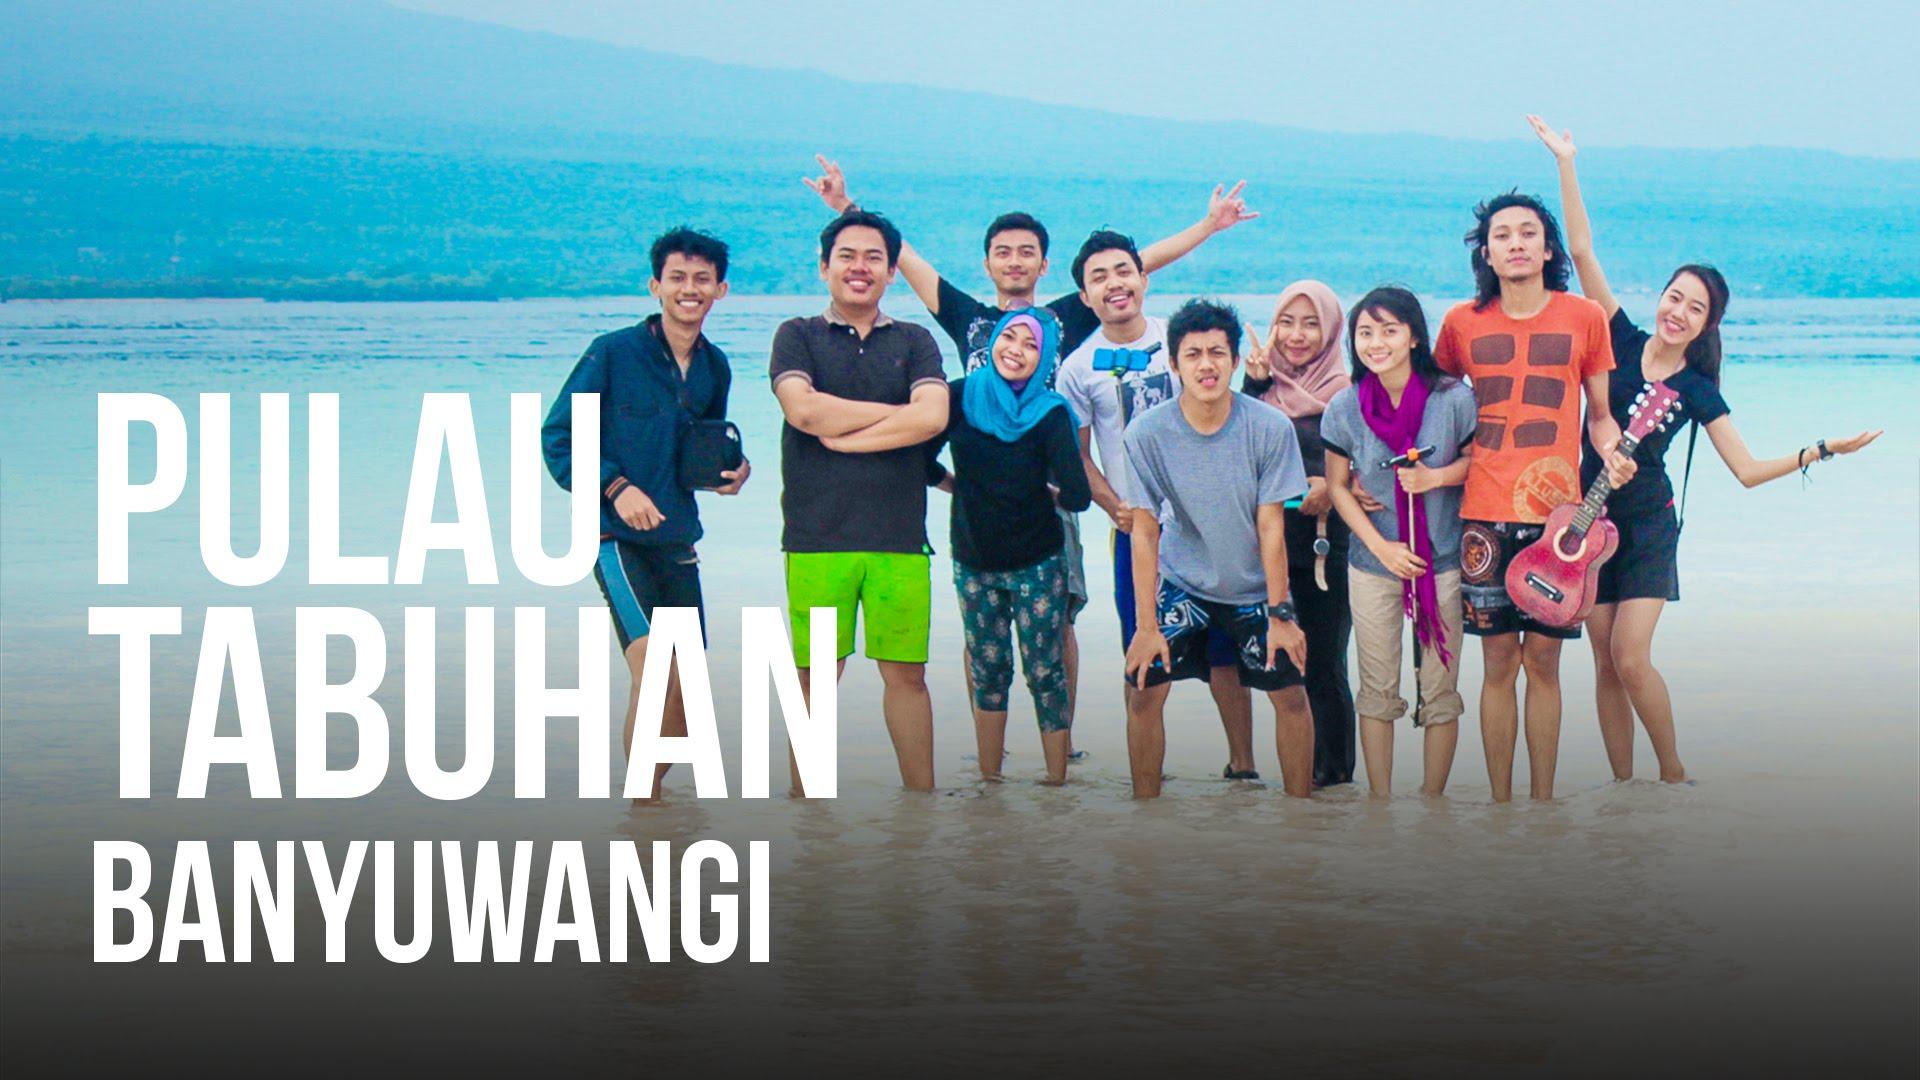 Mbolang Pulau Tabuhan Banyuwangi Youtube Kab